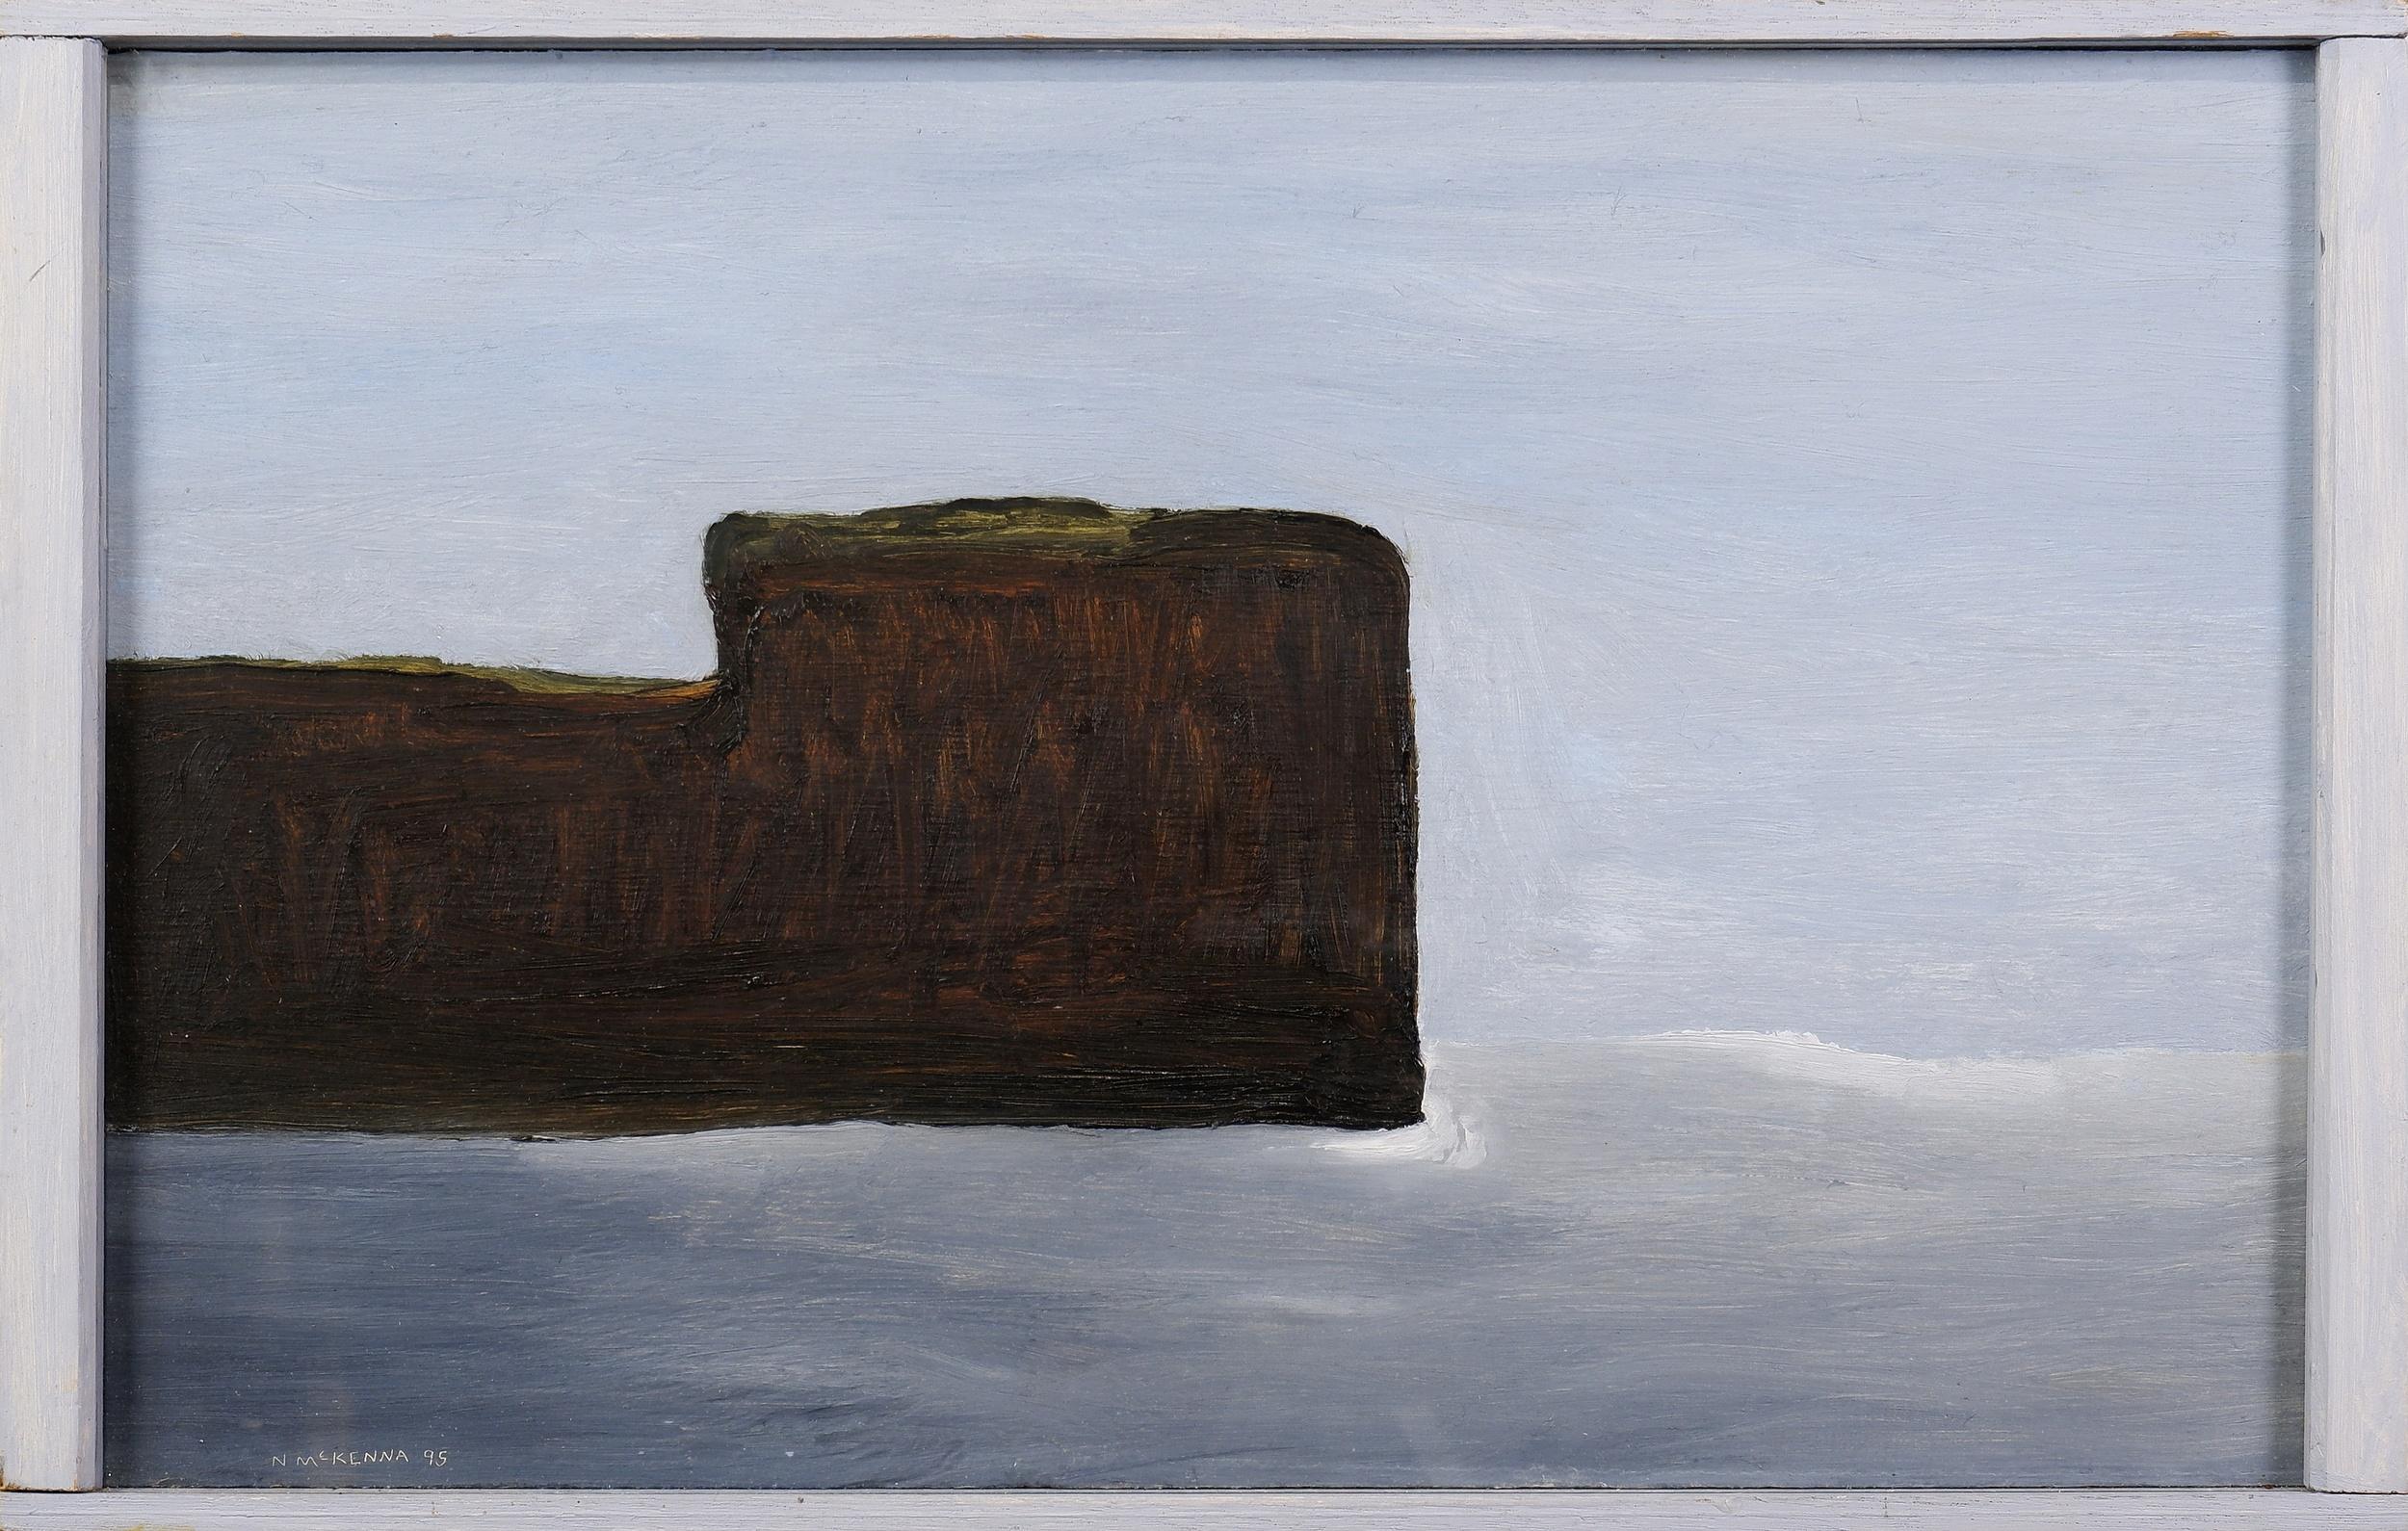 'Noel McKenna (born 1956), Bundeena, South Coast 1995, Oil on Board'